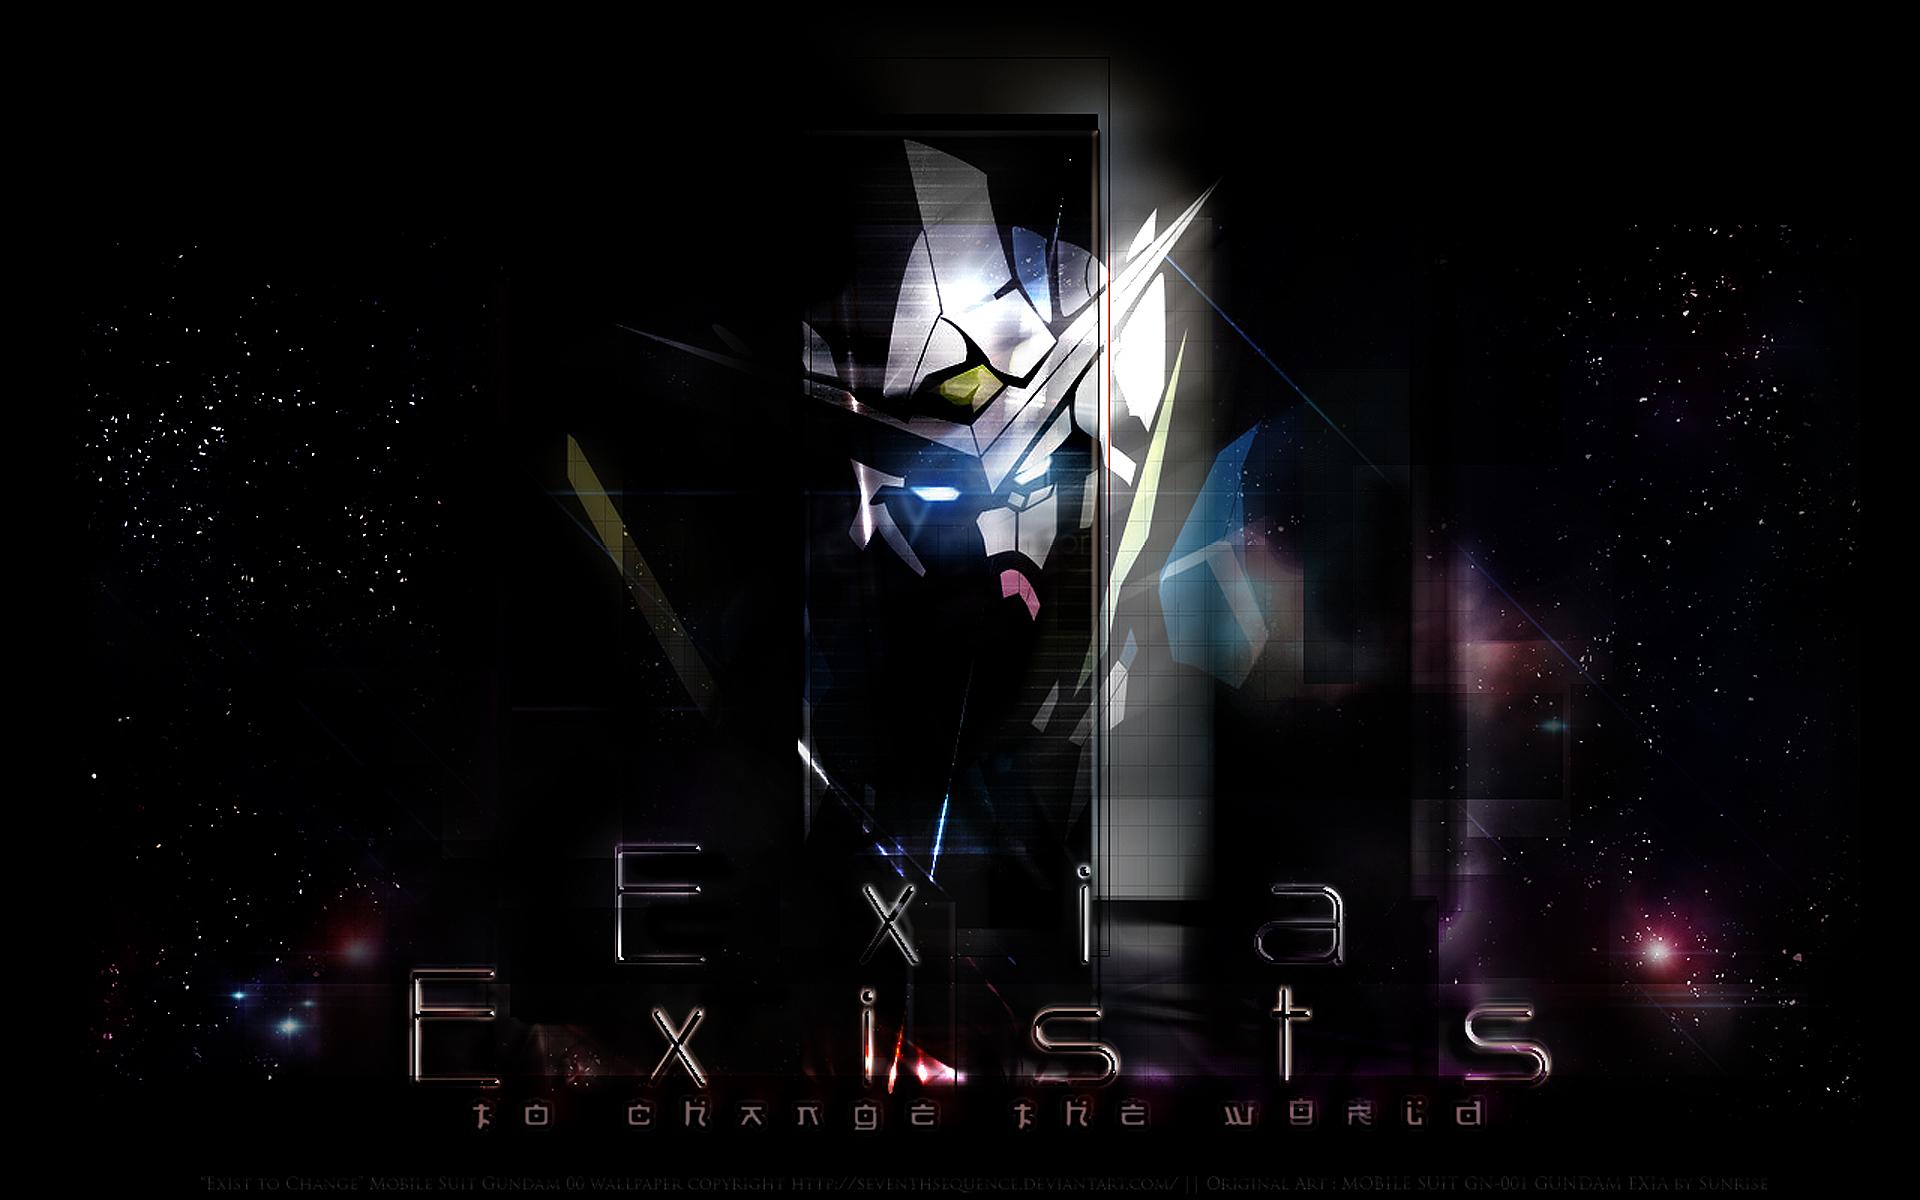 Mecha Gundam Wallpaper 1920x1200 Mecha Gundam 00 Anime 1920x1200